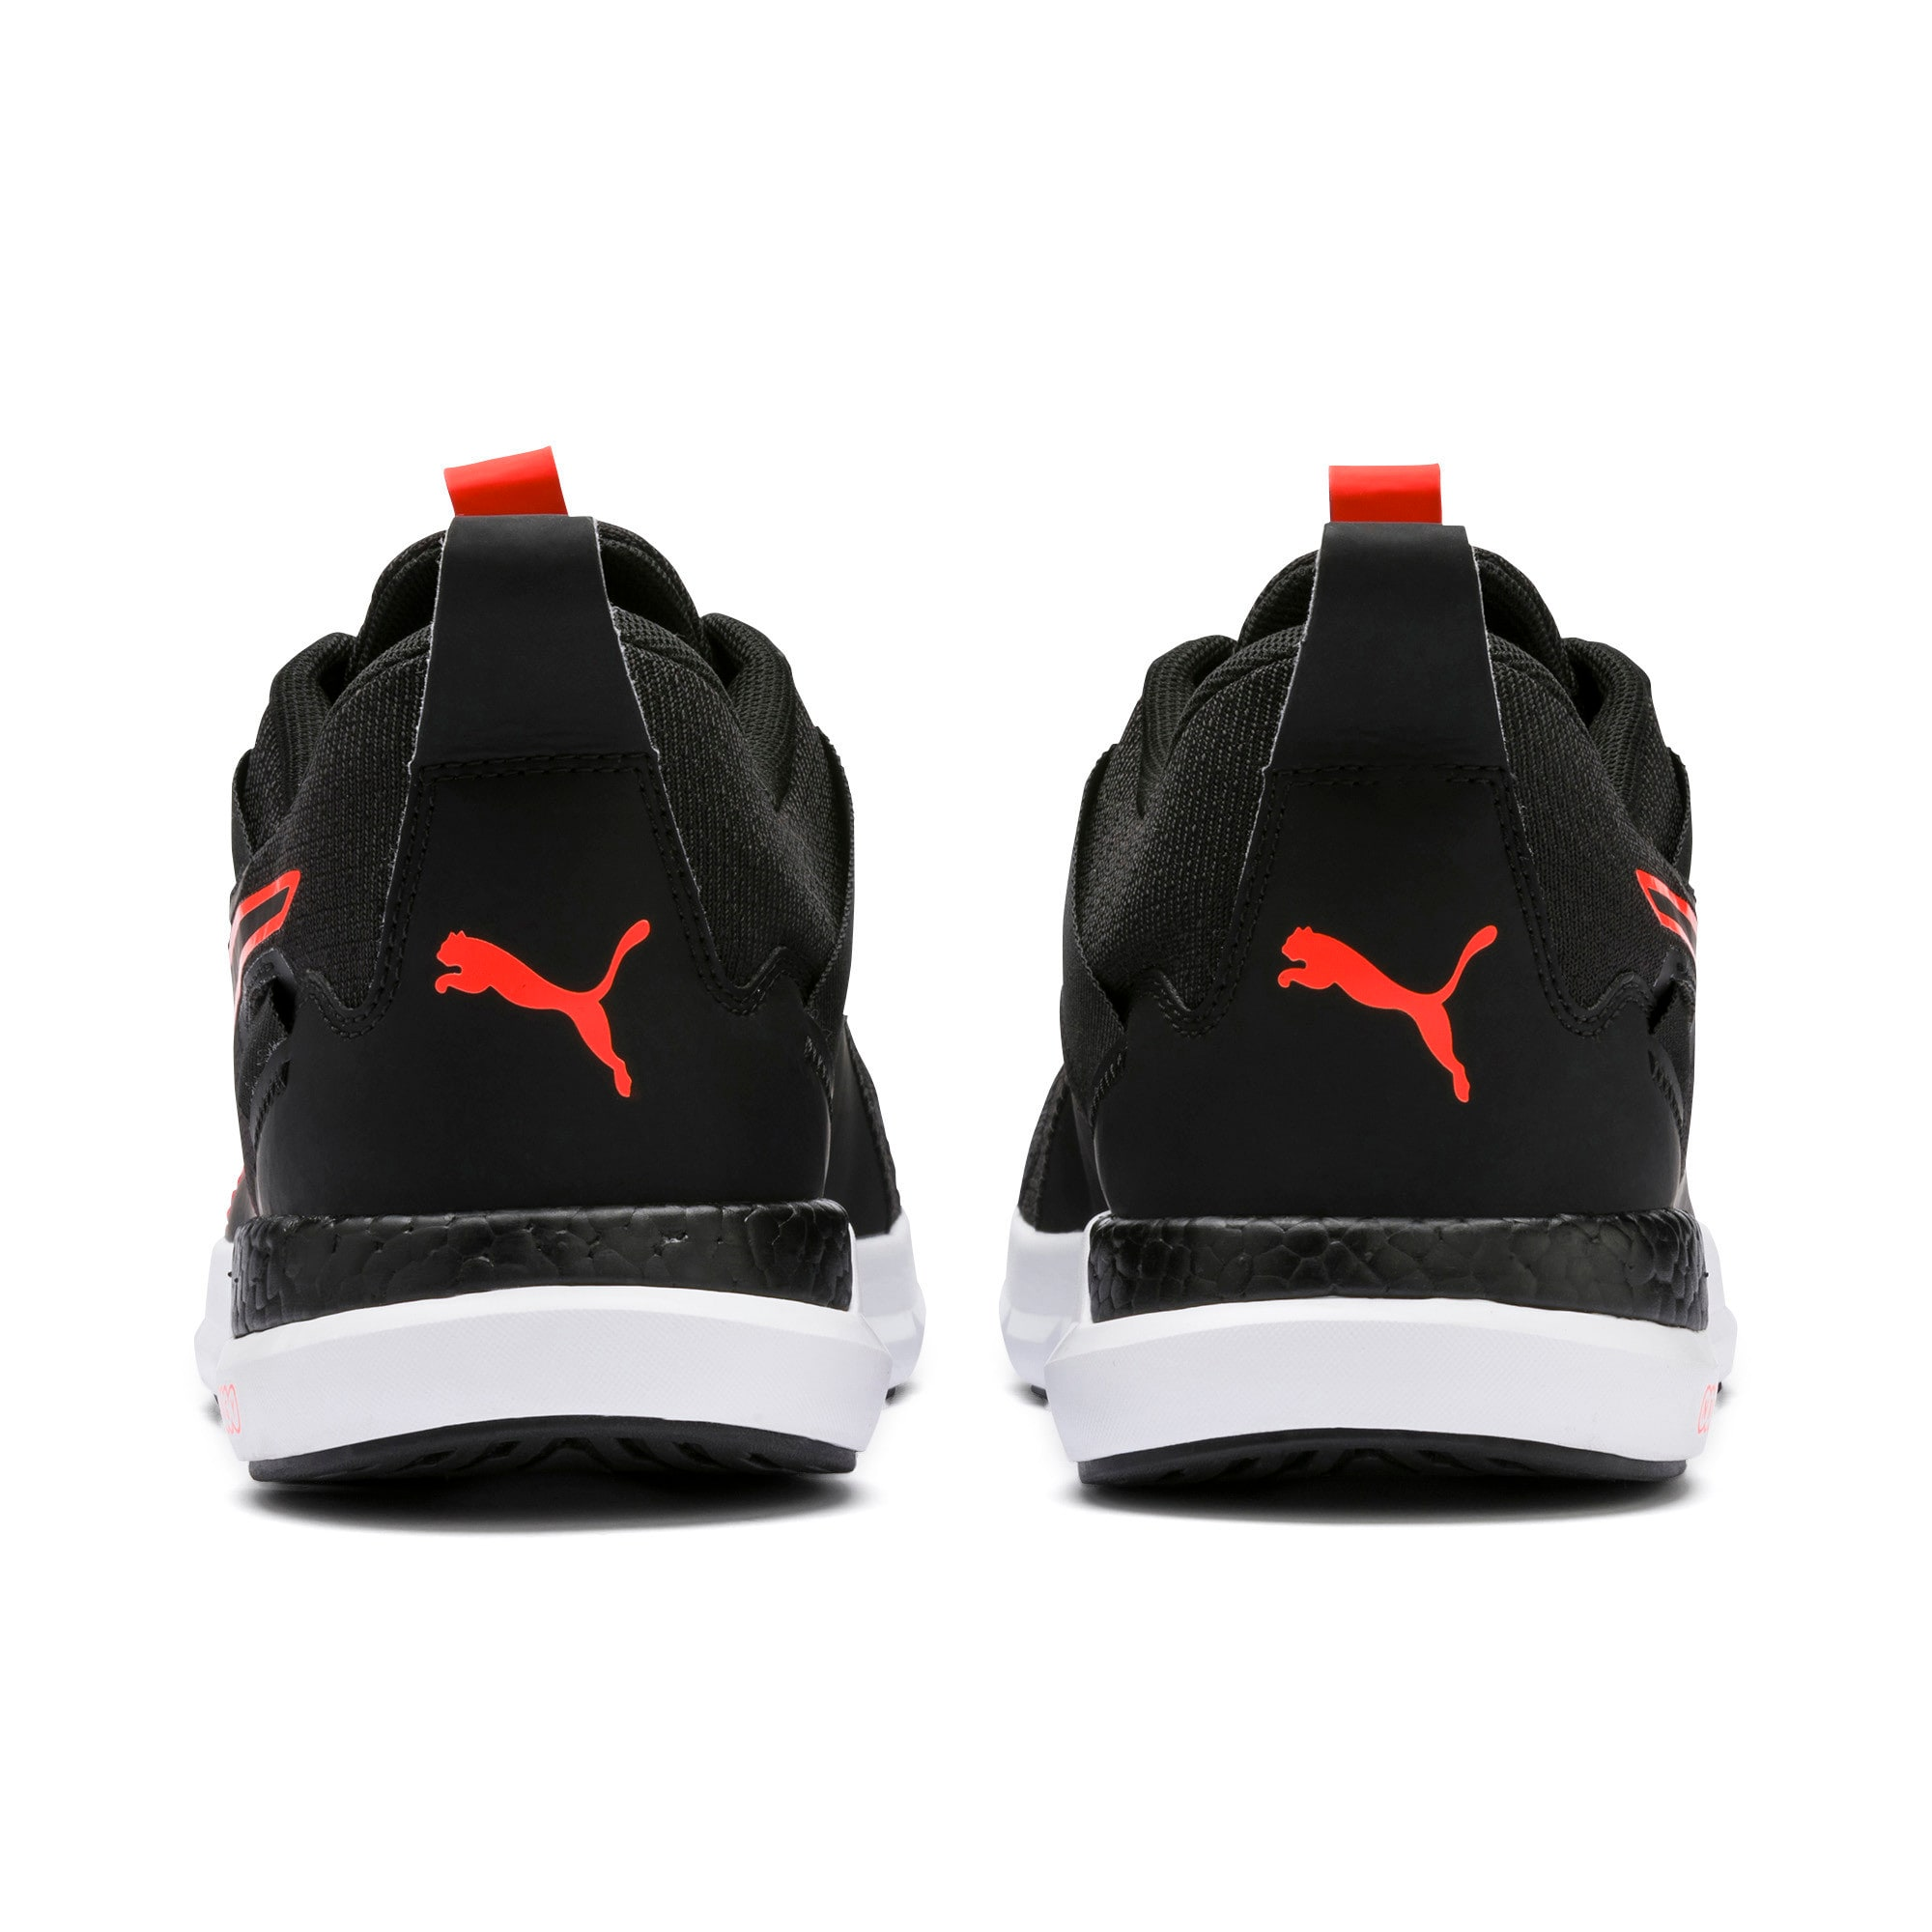 Thumbnail 5 of NRGY Dynamo Futuro Men's Running Shoes, Puma Black-Nrgy Red, medium